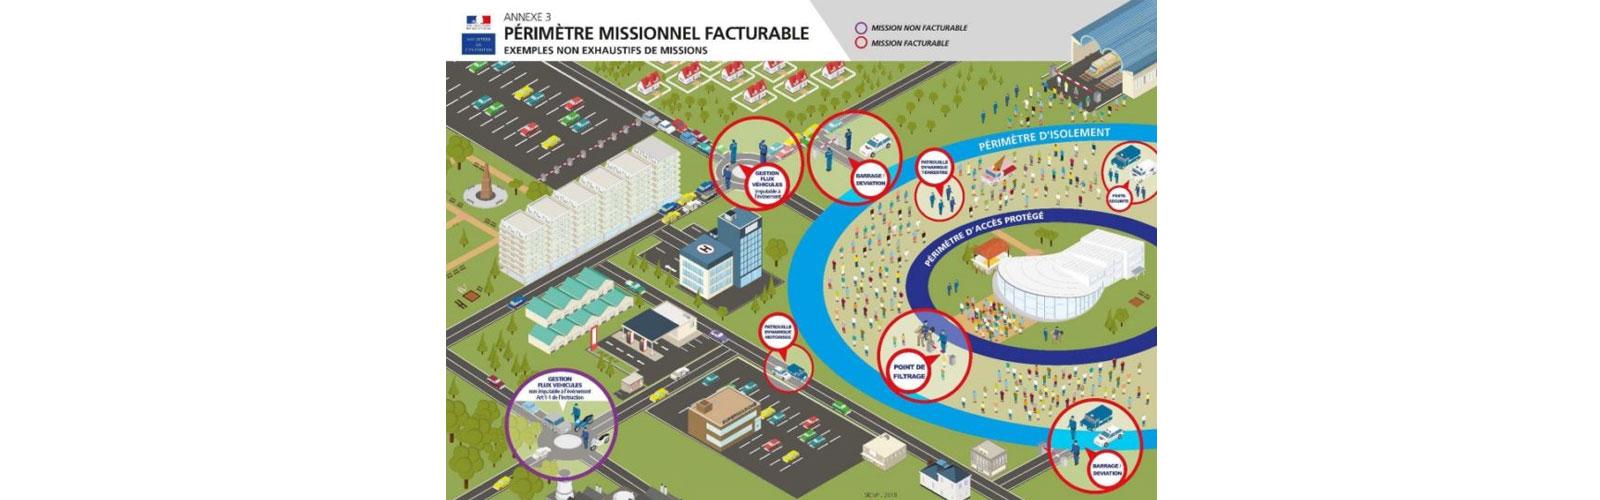 perimetre-missionnel-facturable-festival